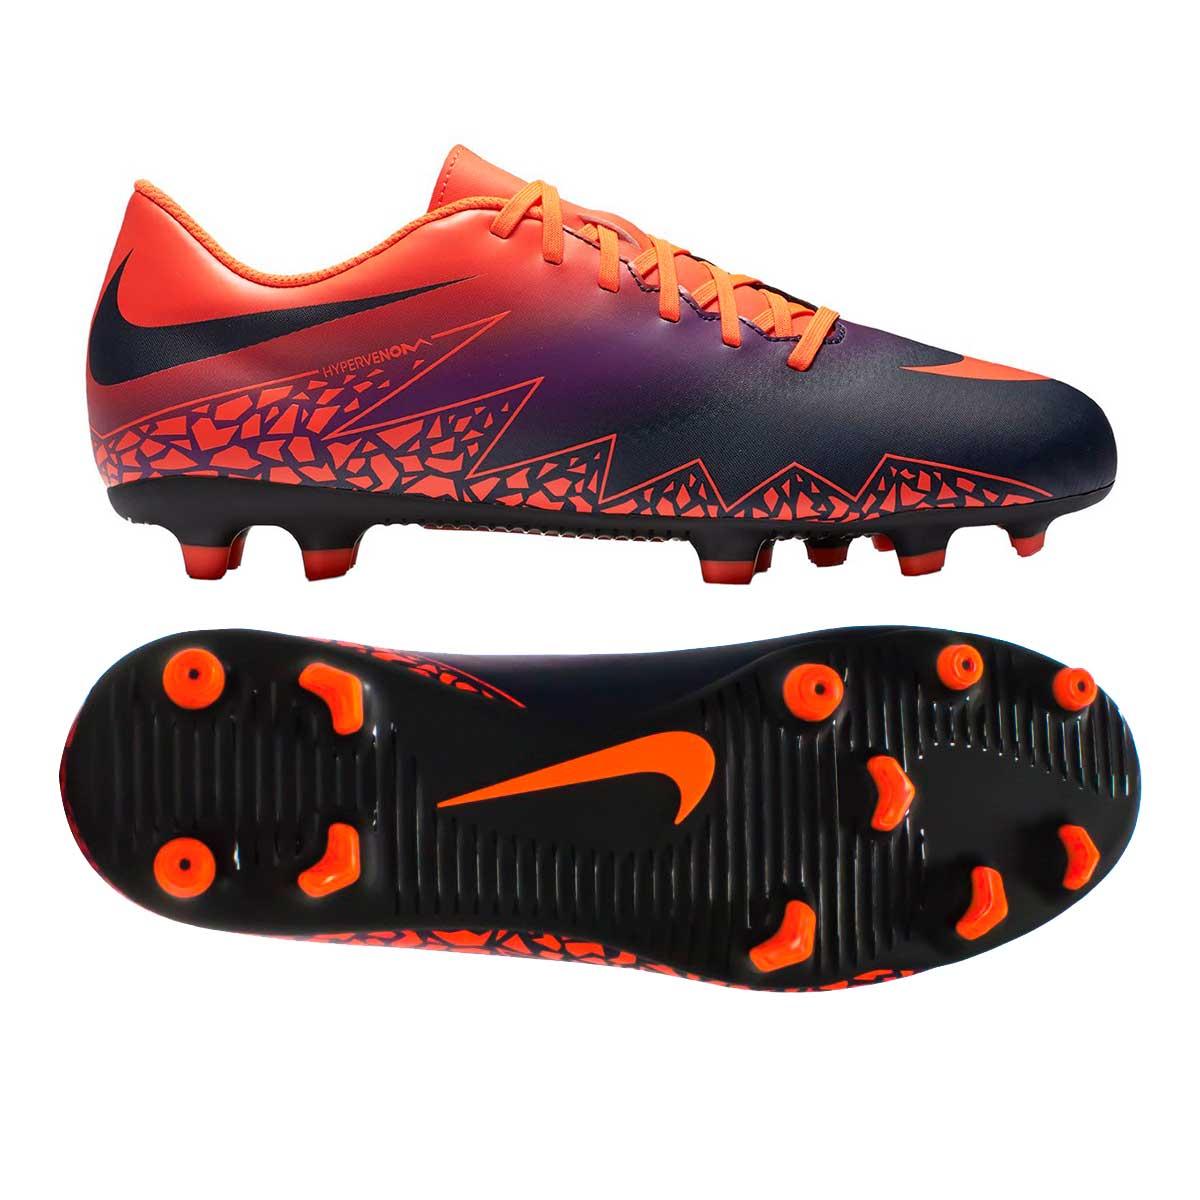 competitive price a3e42 1e844 Nike Hypervenom Phade II FG Football Shoes (Crimson/Obsidian)